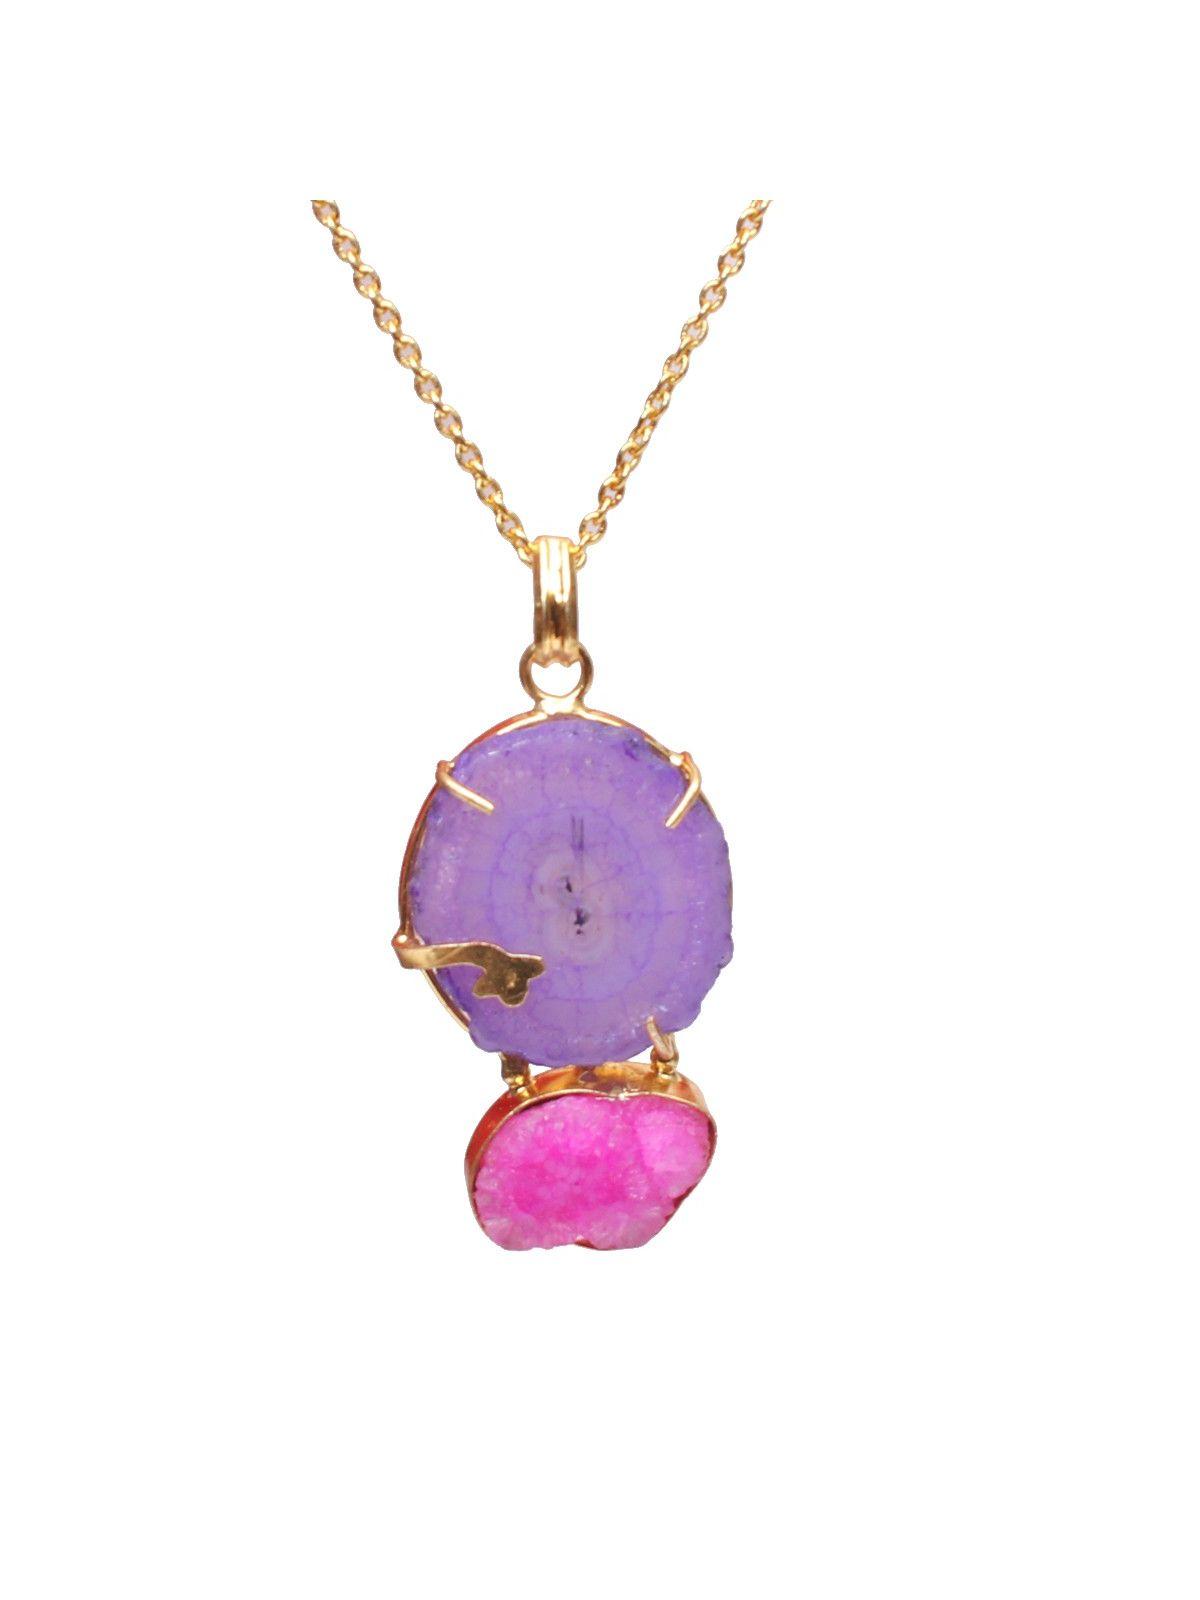 Ultraviolet Venus pendant